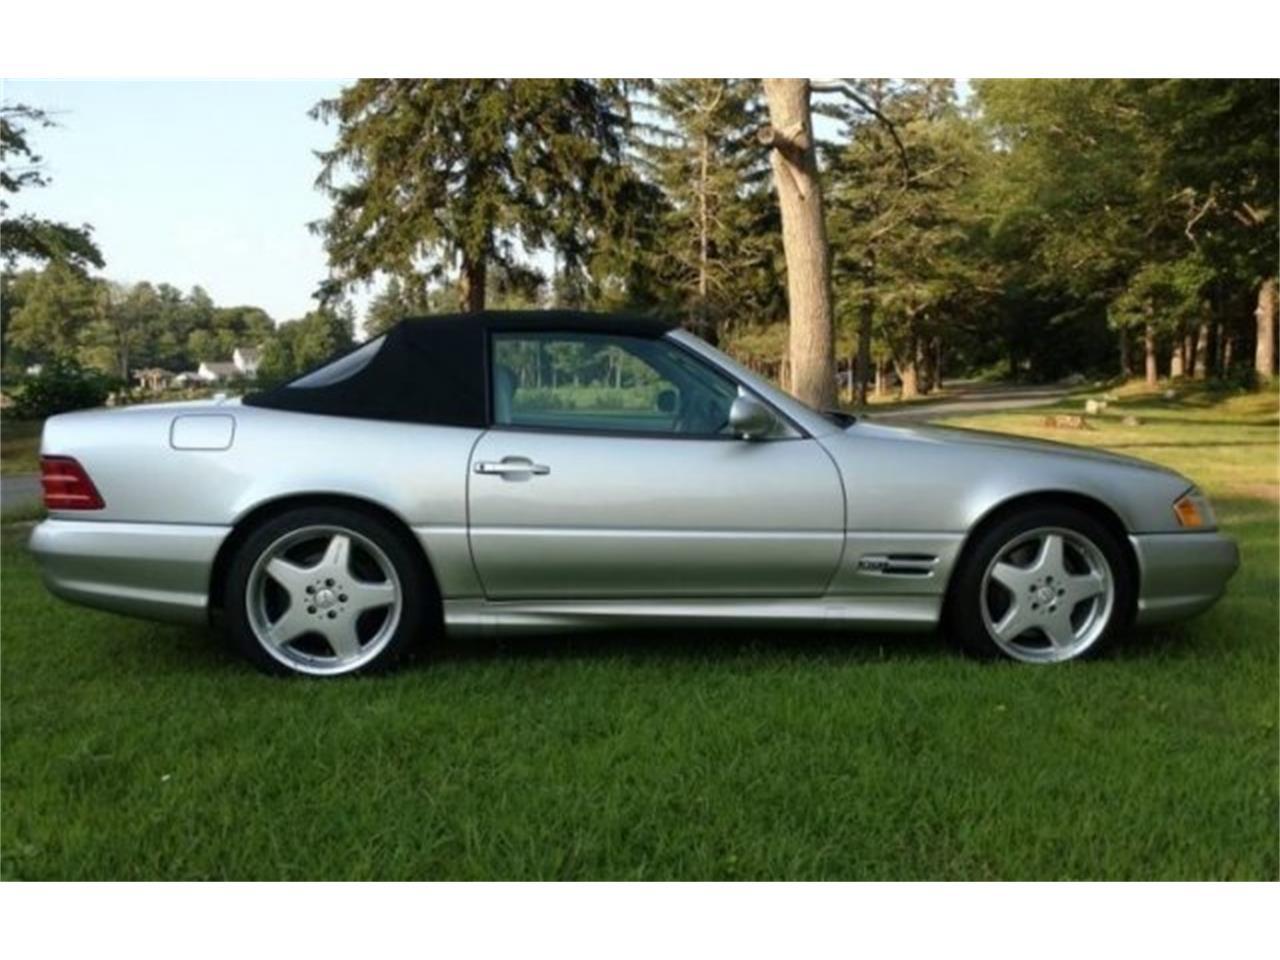 2000 mercedes benz sl500 for sale classiccars com cc 1200888 2000 mercedes benz sl500 for sale